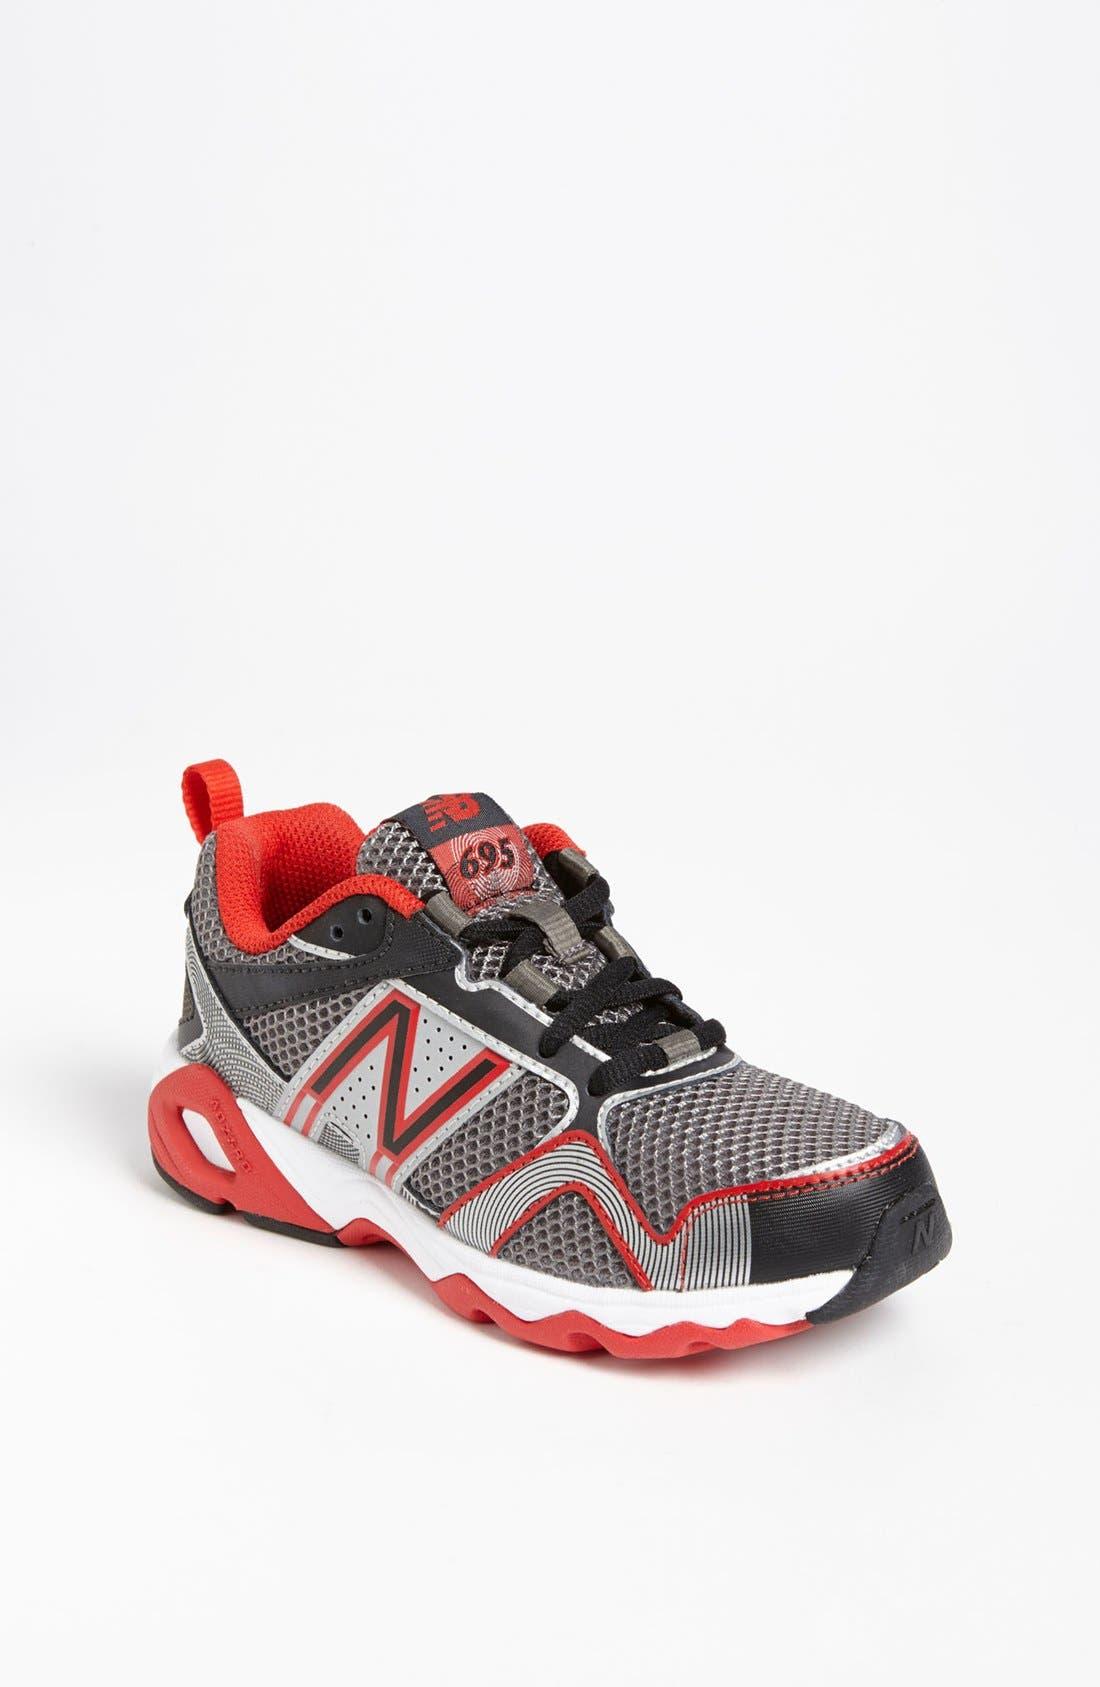 Alternate Image 1 Selected - New Balance '695' Sneaker (Toddler, Little Kid & Big Kid) (Online Only)